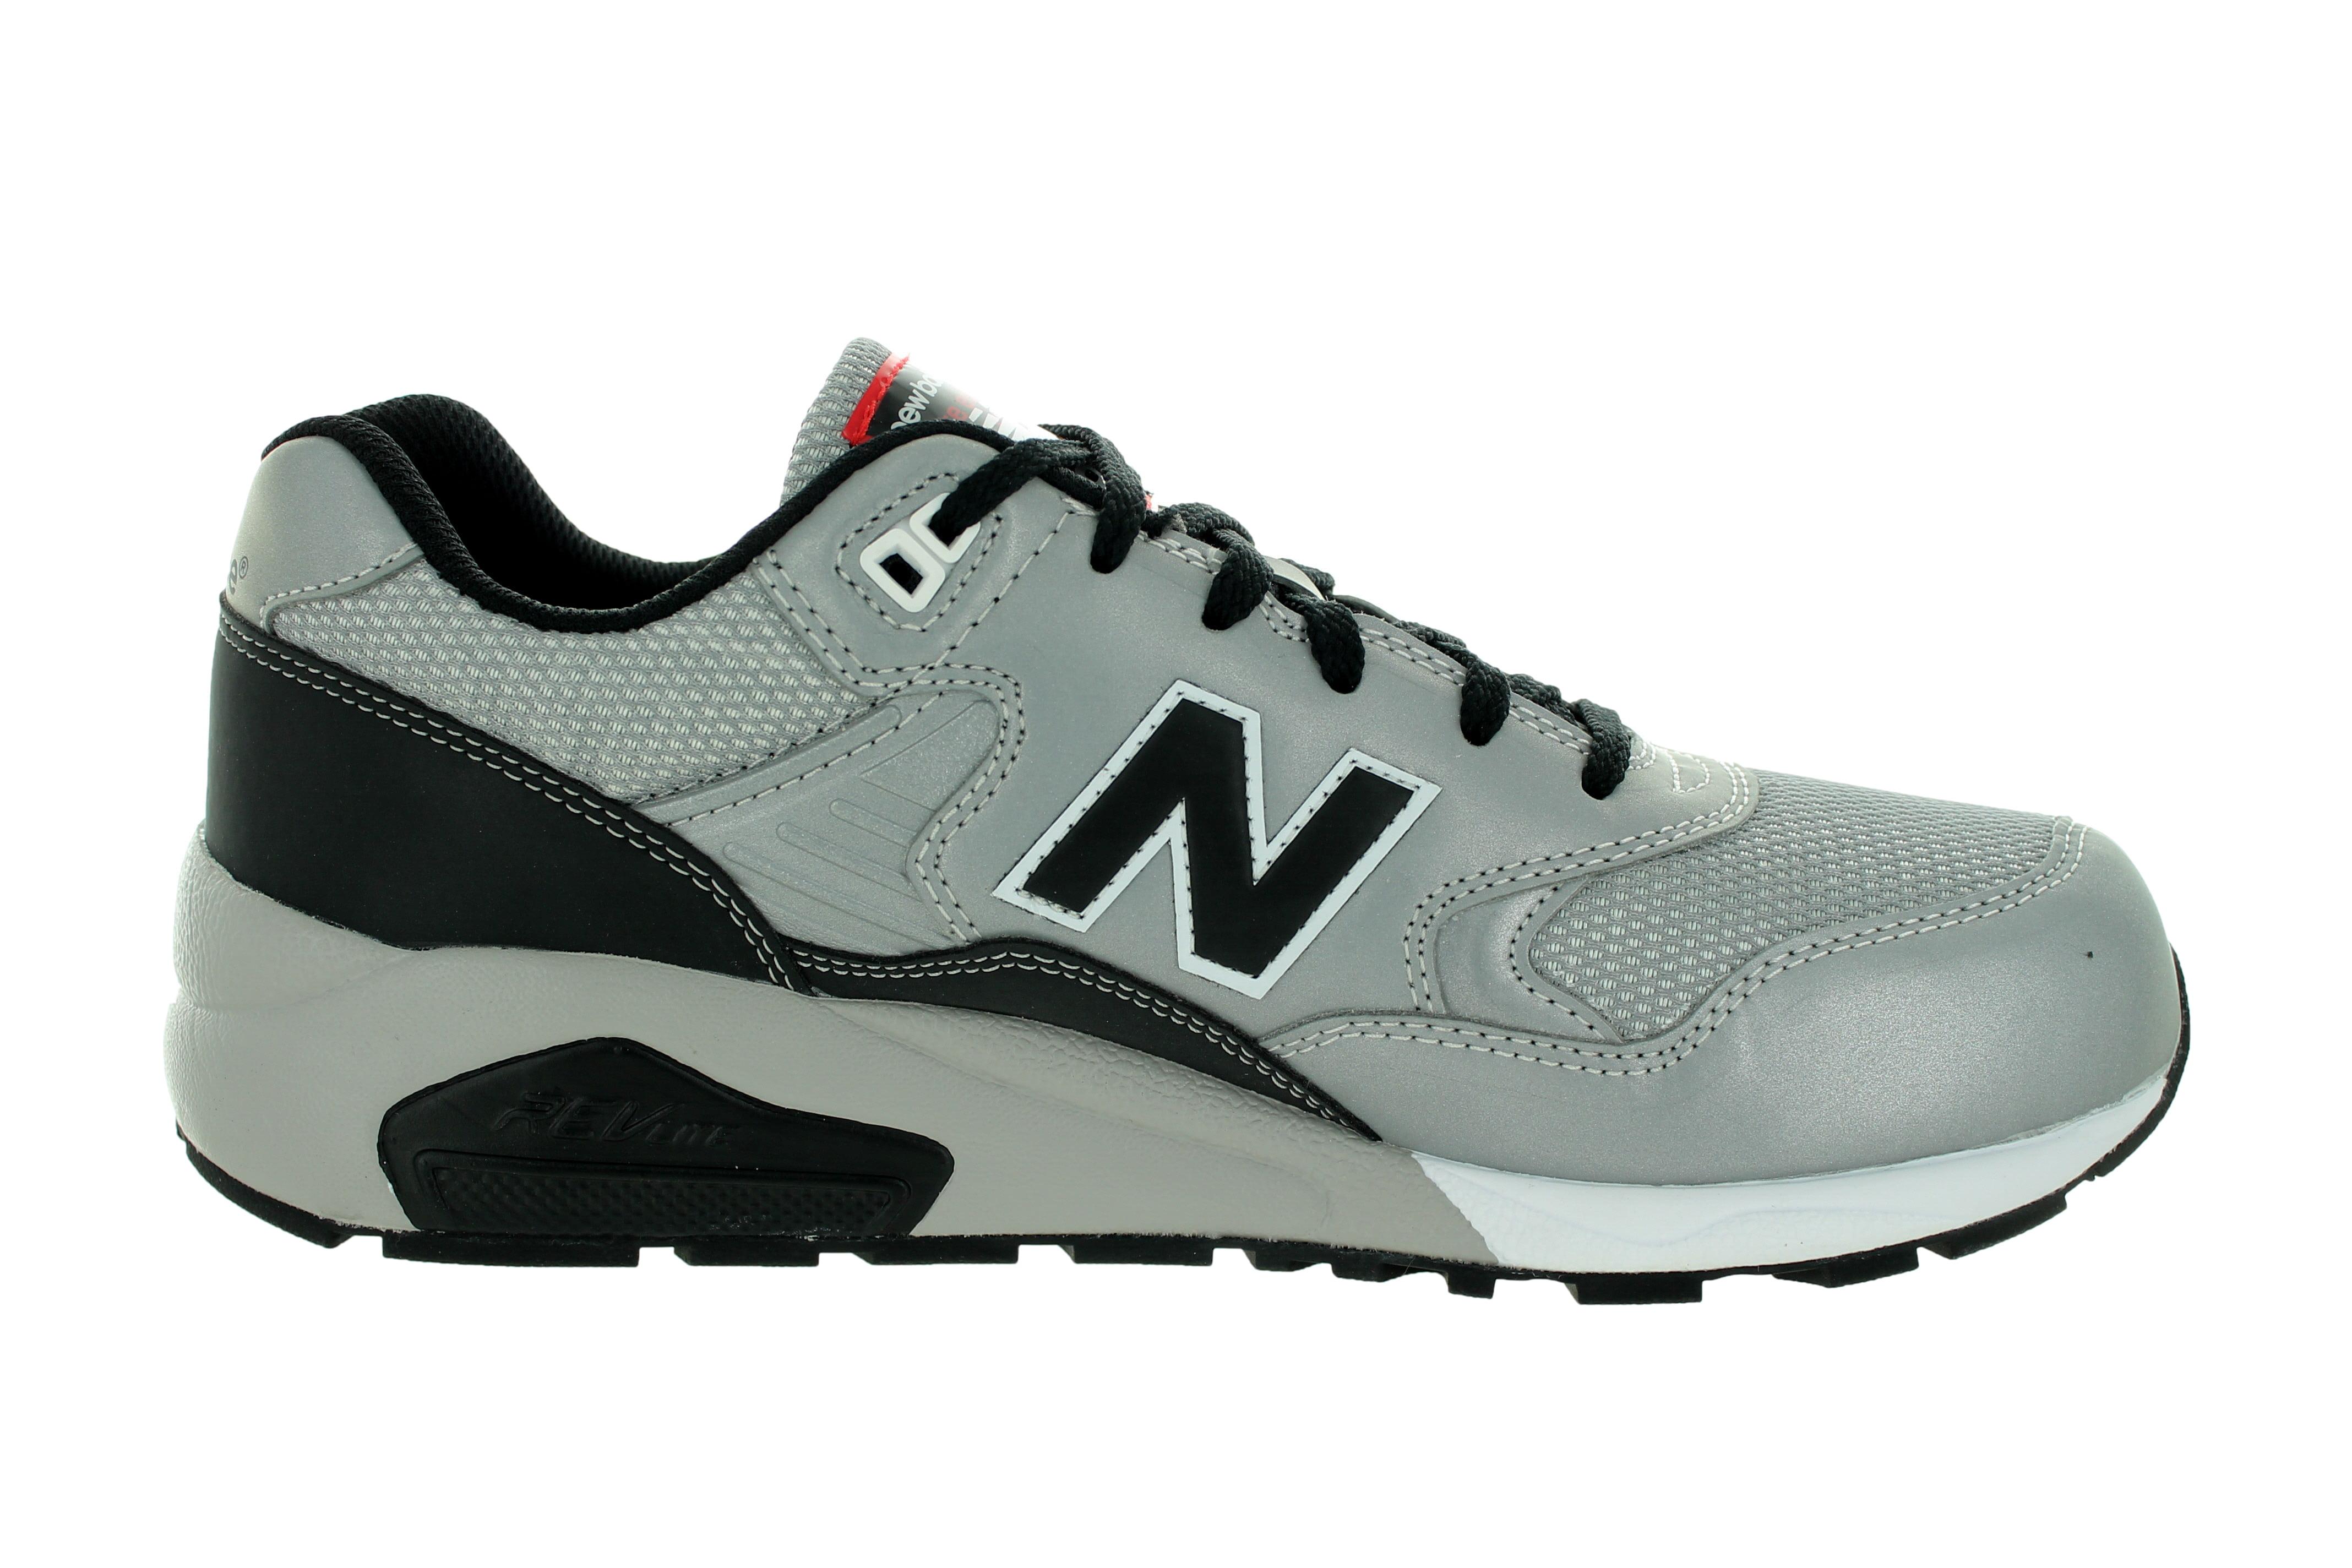 New Balance Men's 580 Lifestyle Running Shoe